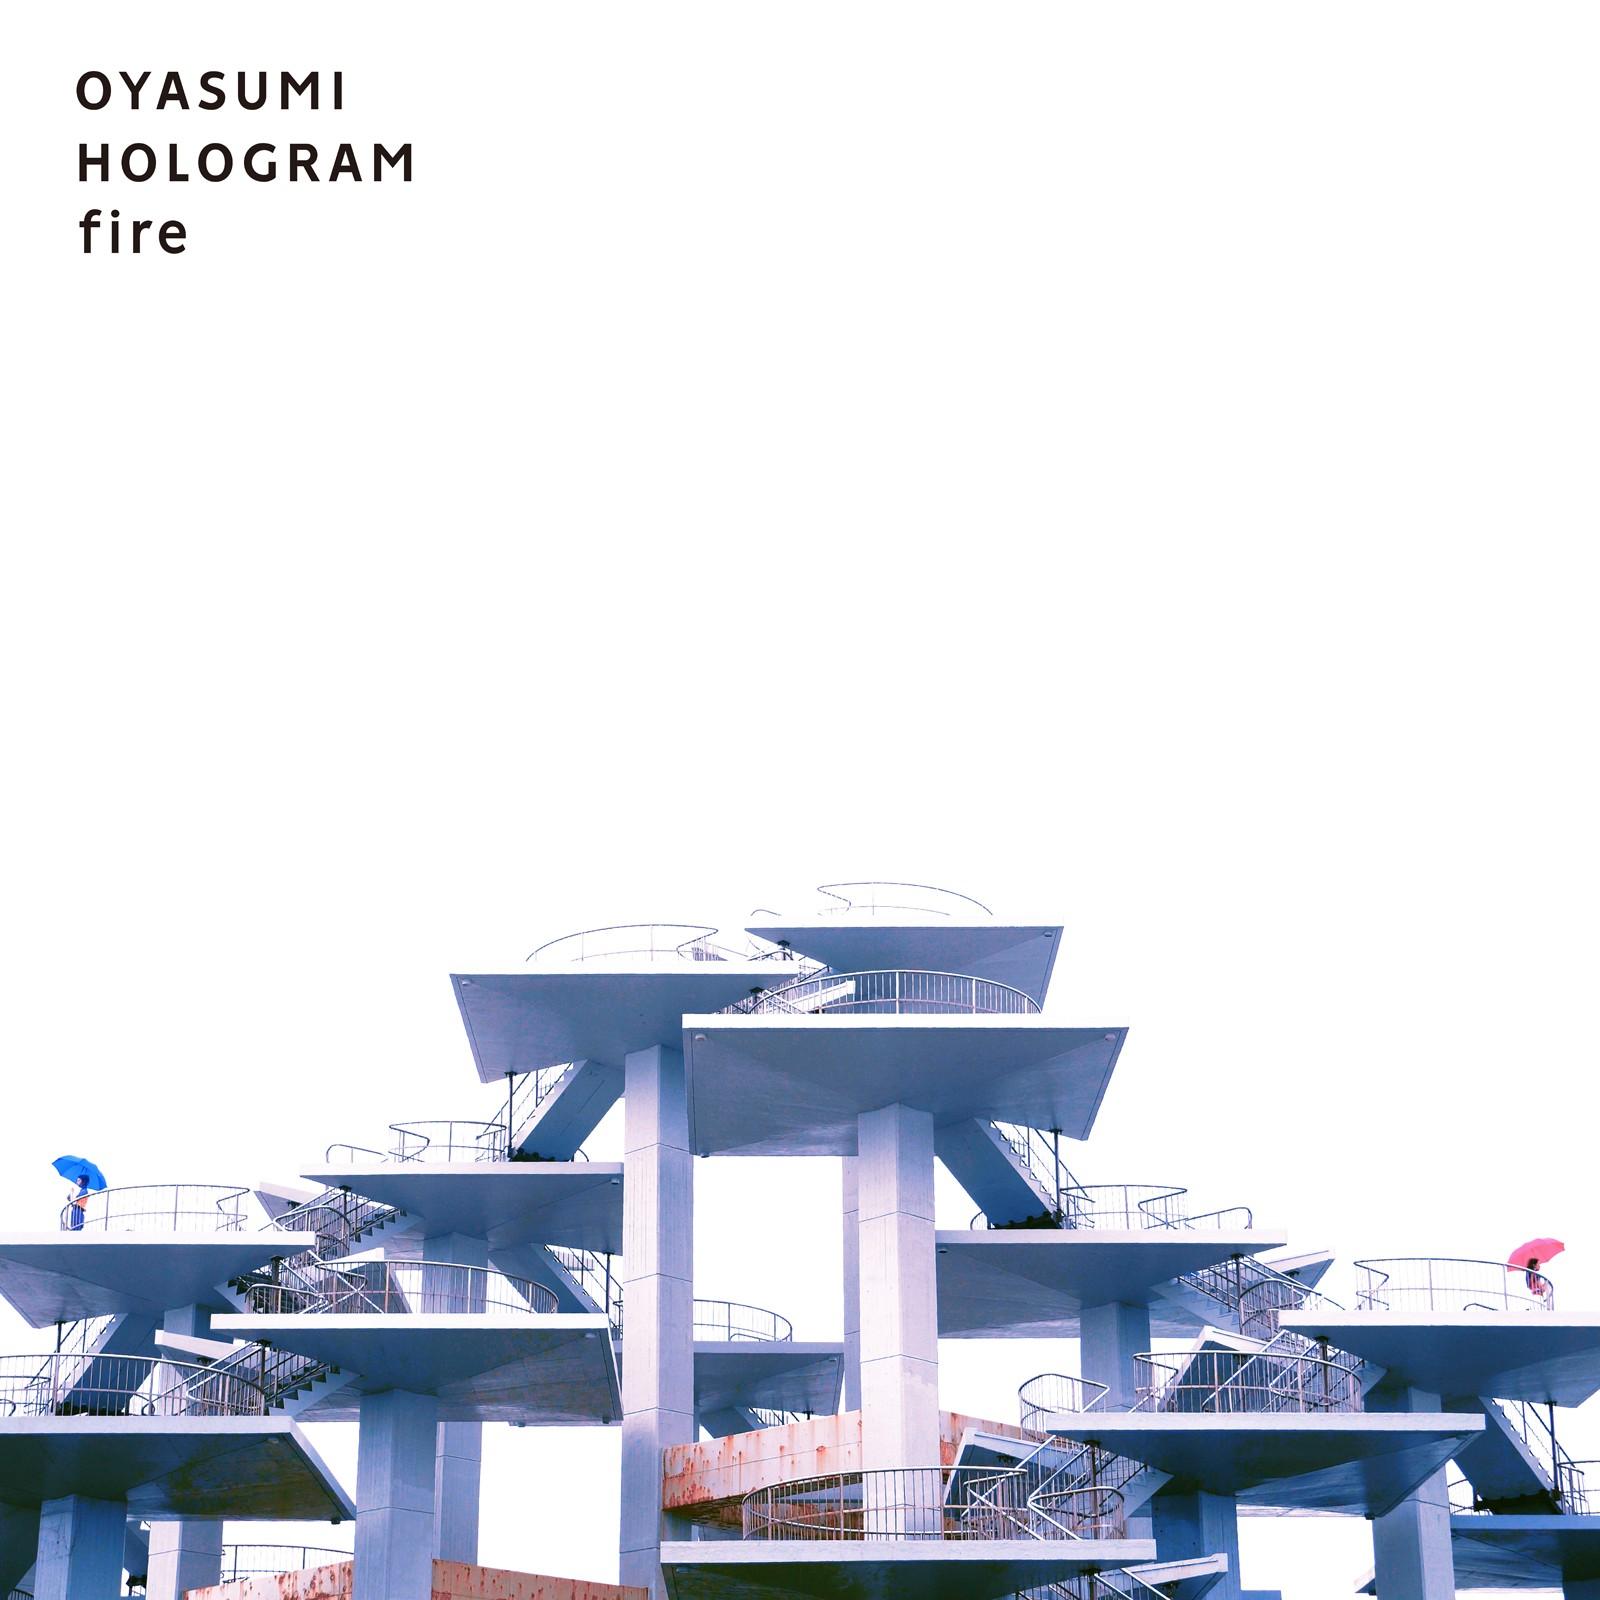 Oyasumi Hologram (おやすみホログラム) – fire [FLAC / 24bit Lossless / WEB] [2018.09.21]